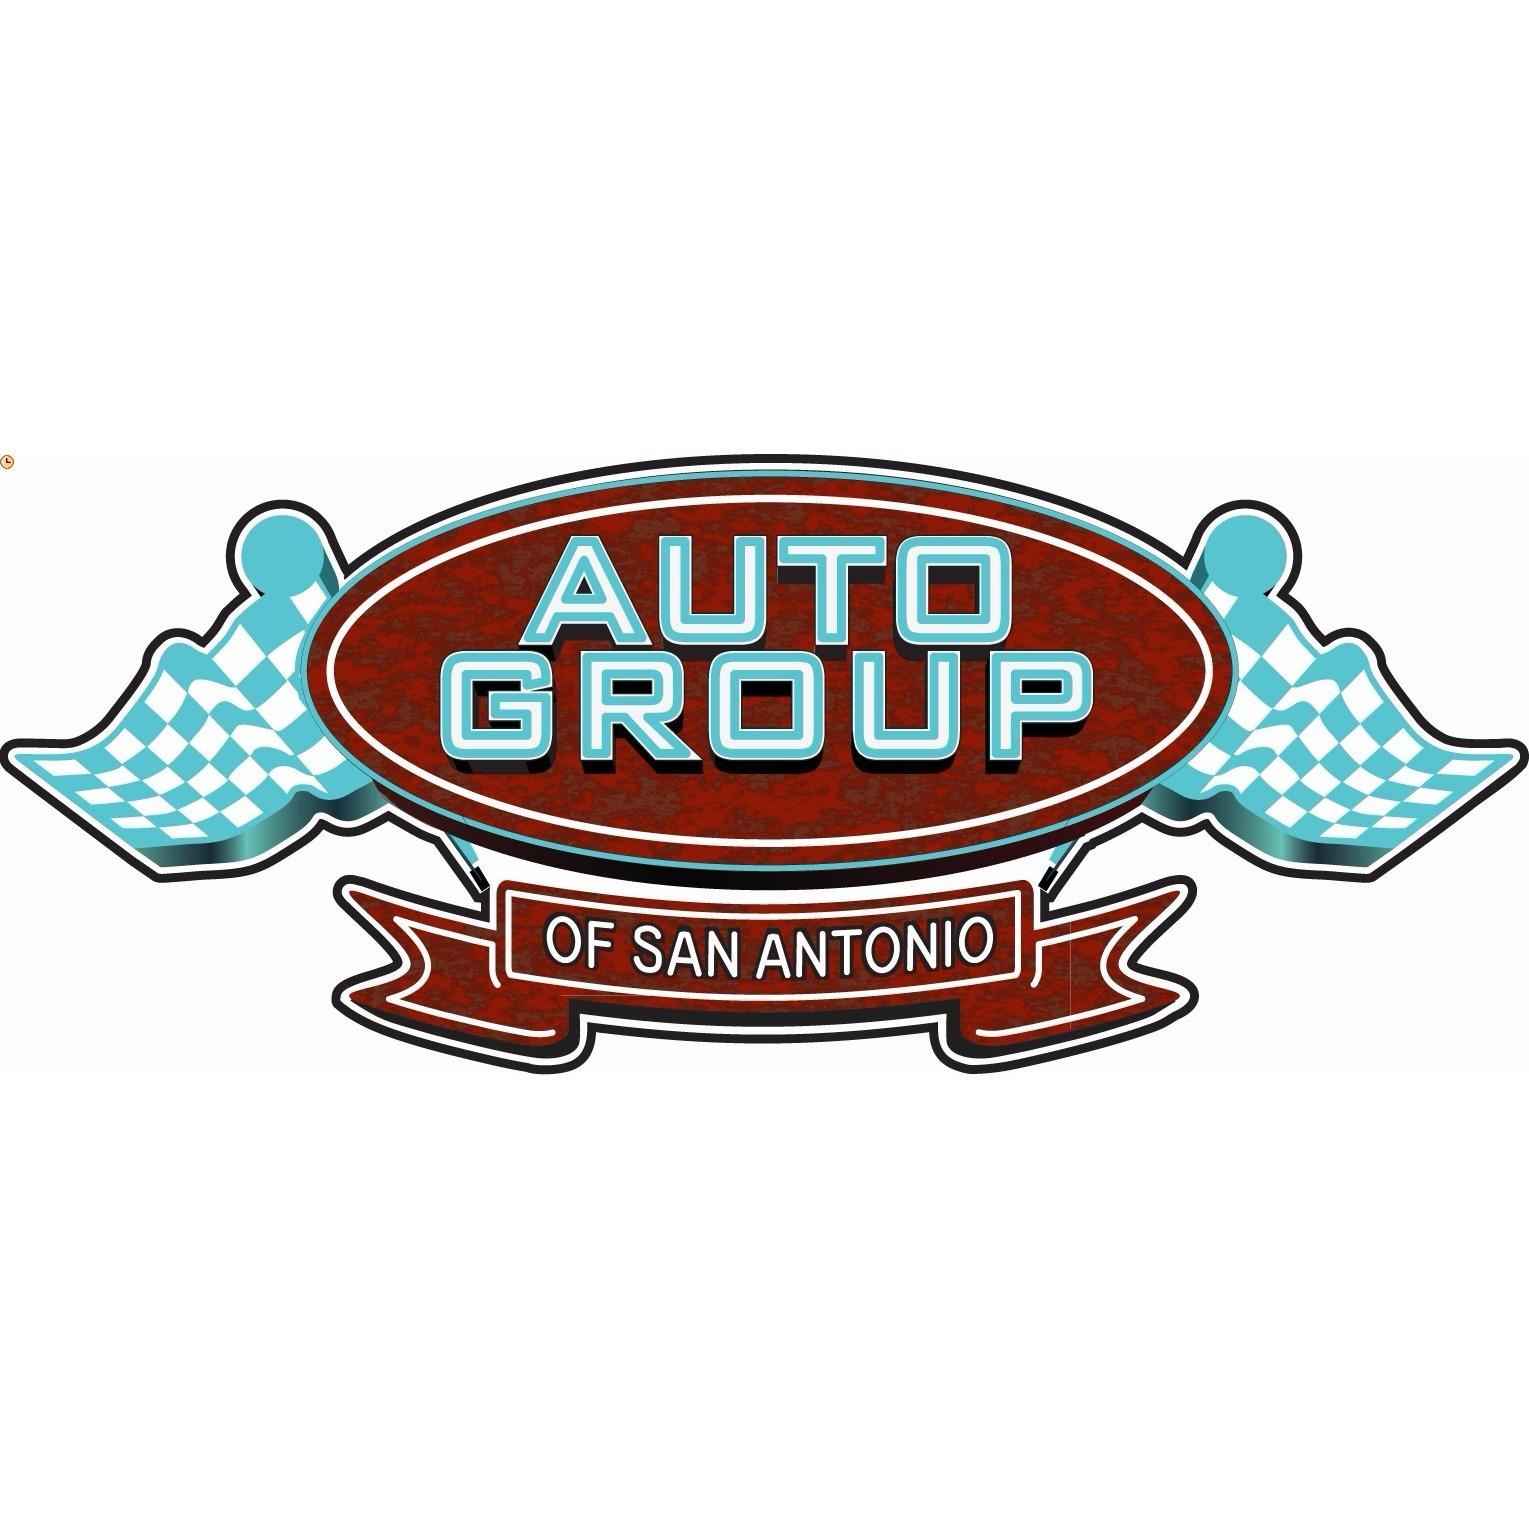 San Antonio Auto Group >> Auto Group Of San Antonio Auto Body Shop San Antonio Tx 78232